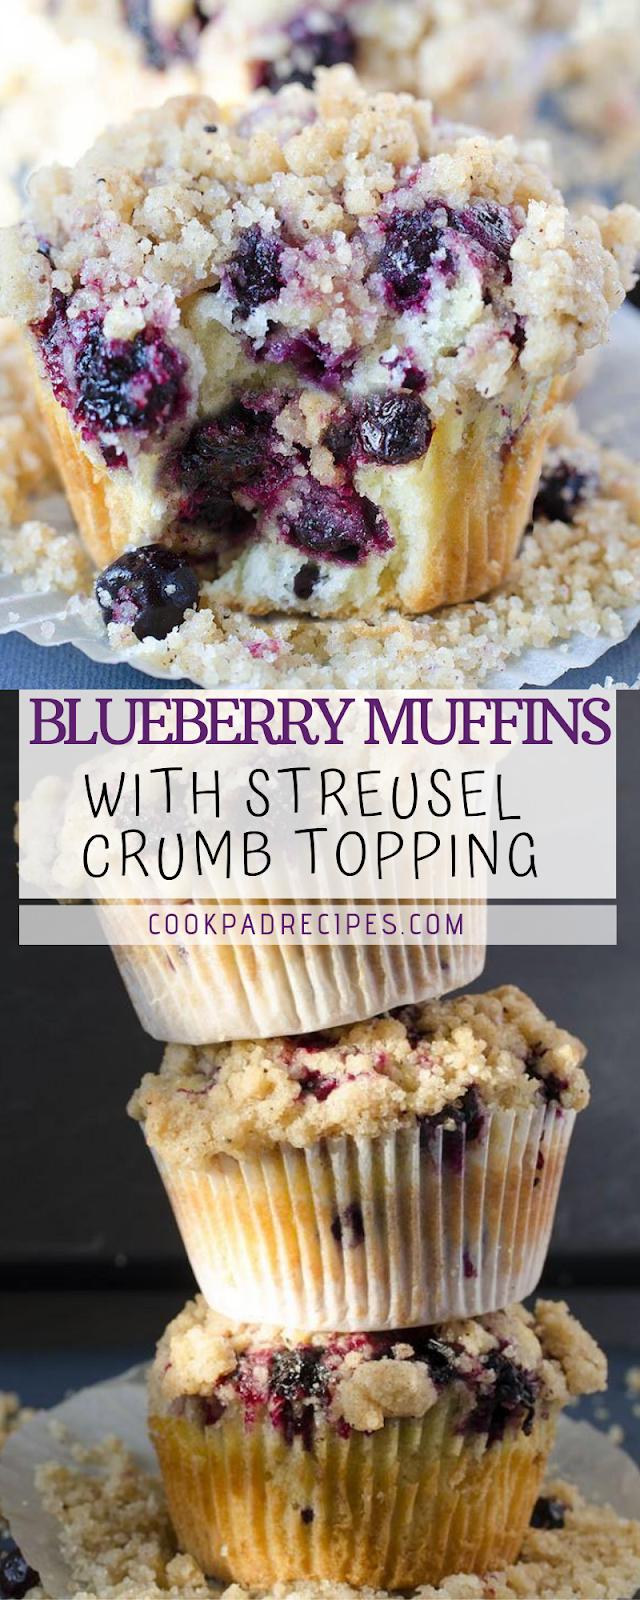 Blueberry Muffіnѕ Wіth Streusel Crumb Tорріng